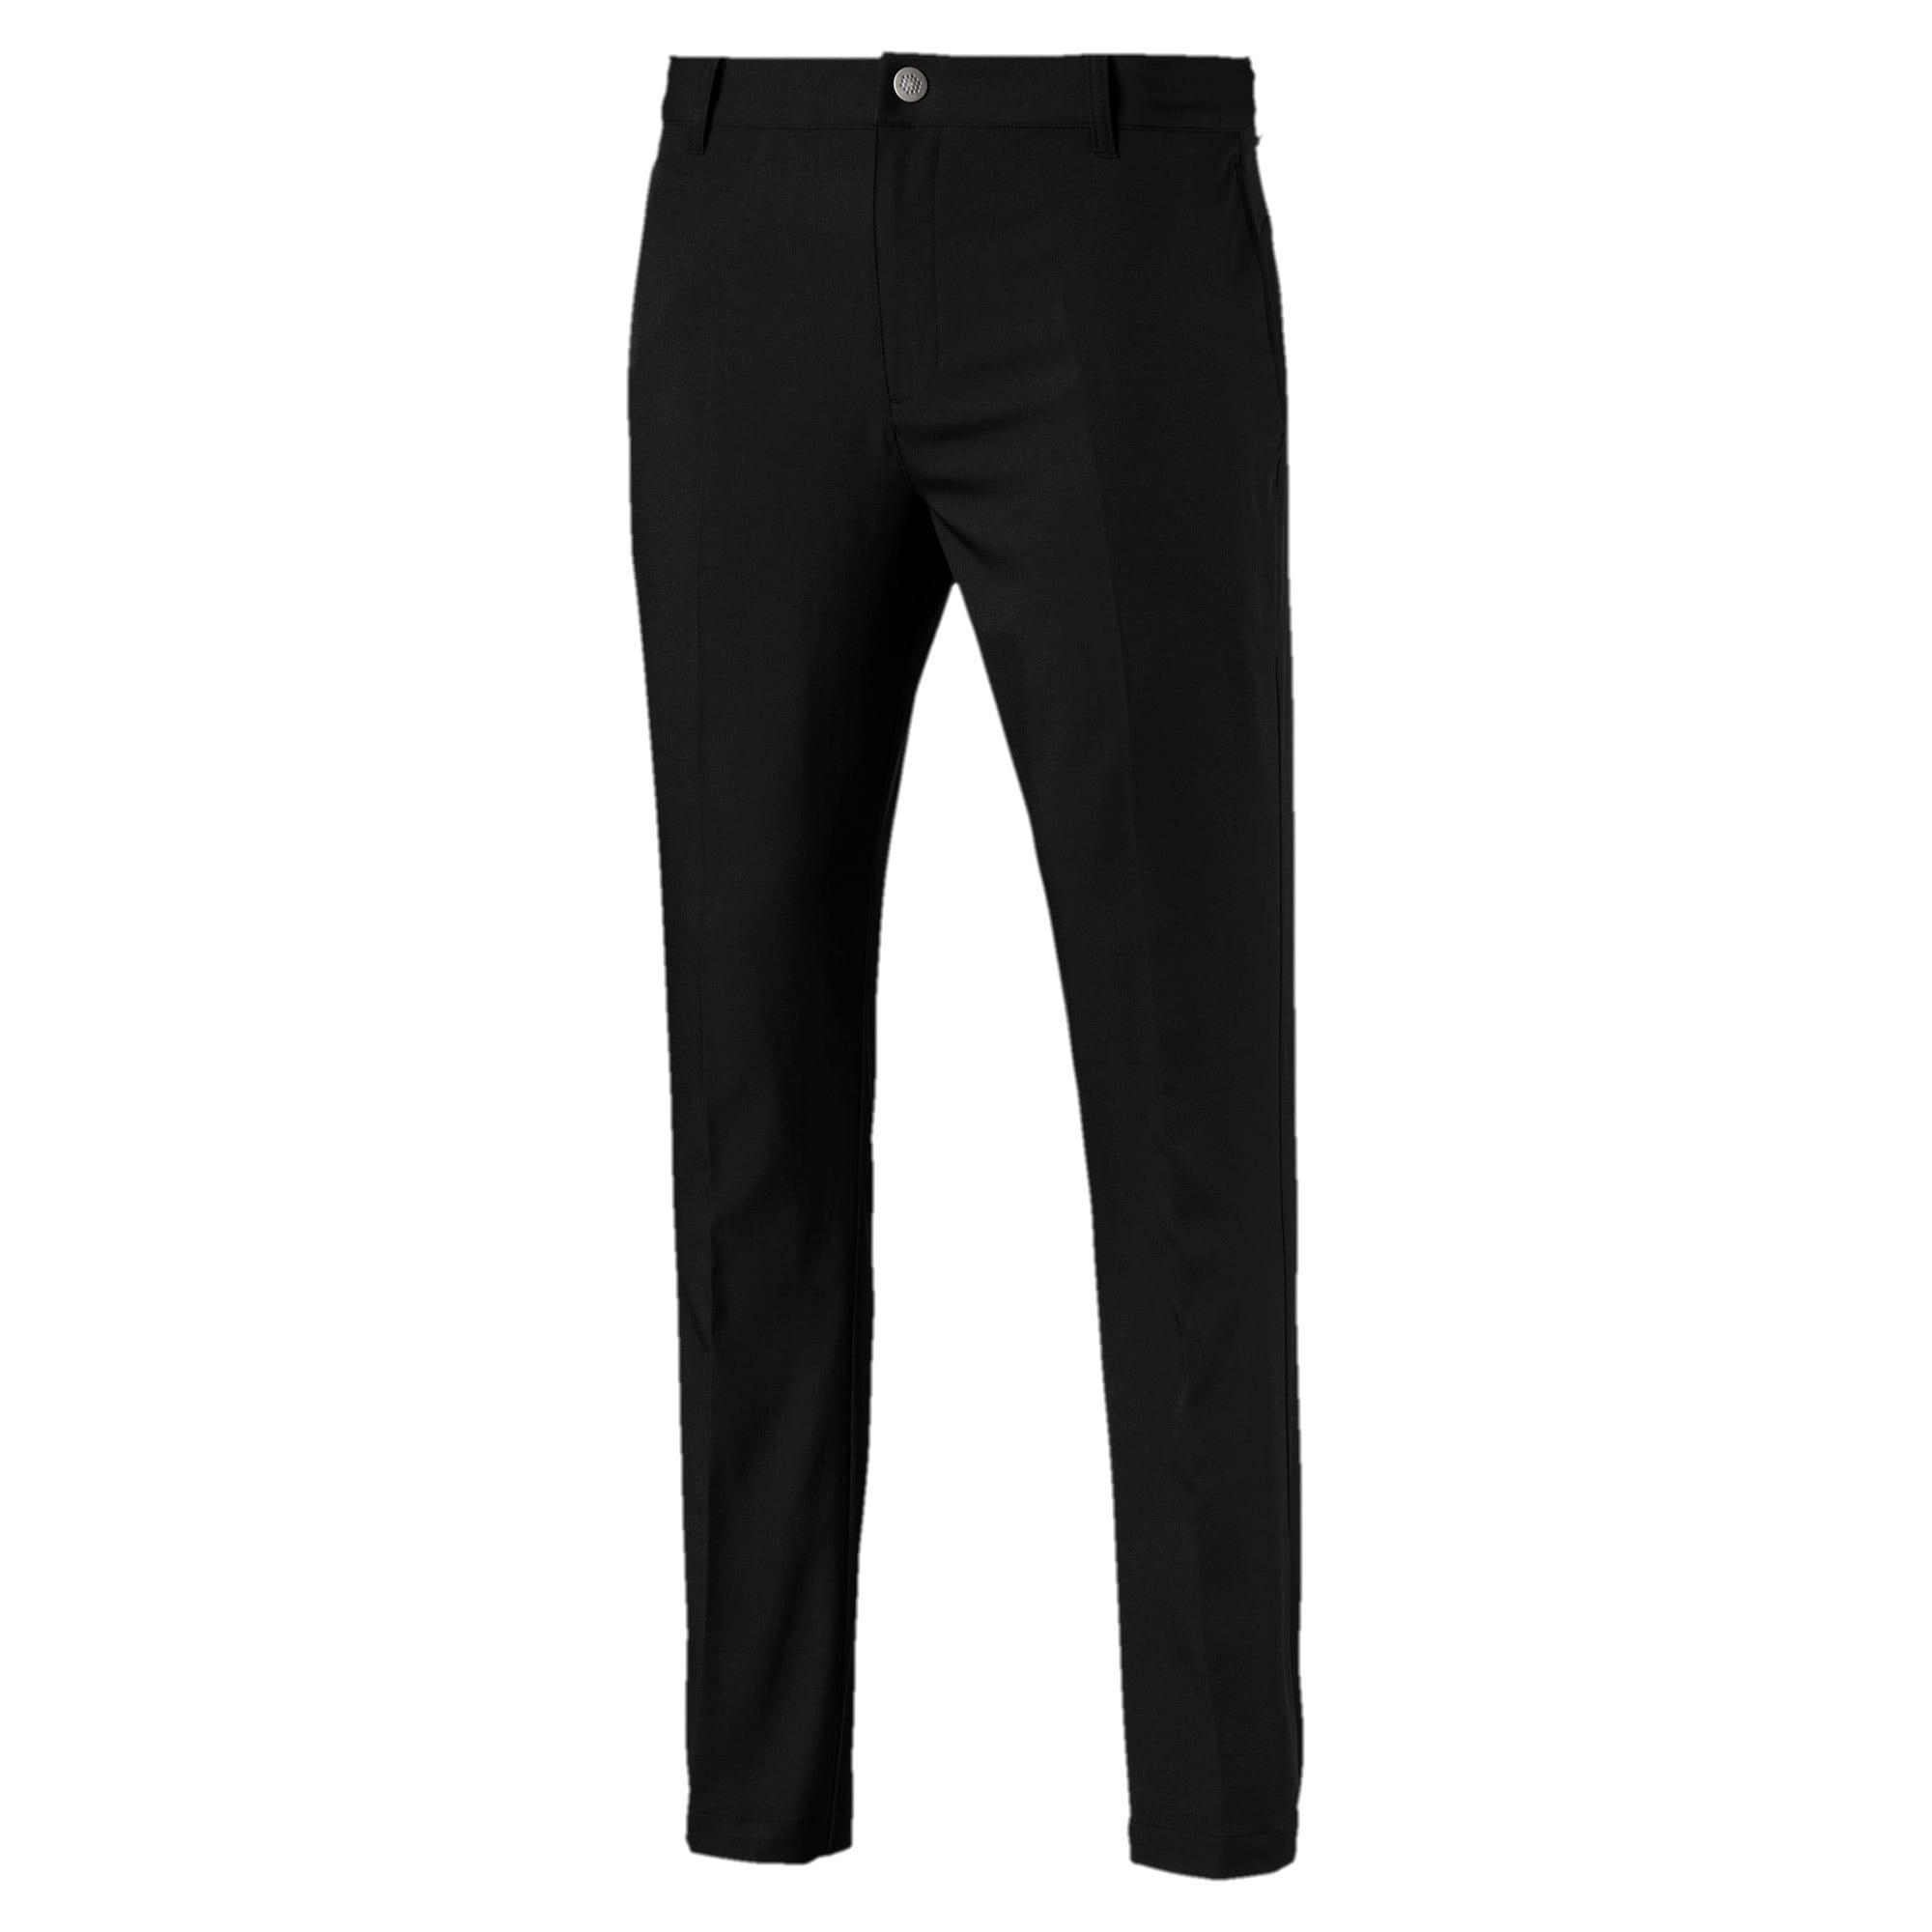 Thumbnail 1 of Afkledende geweven Jackpot golfbroek voor heren, Puma Black, medium